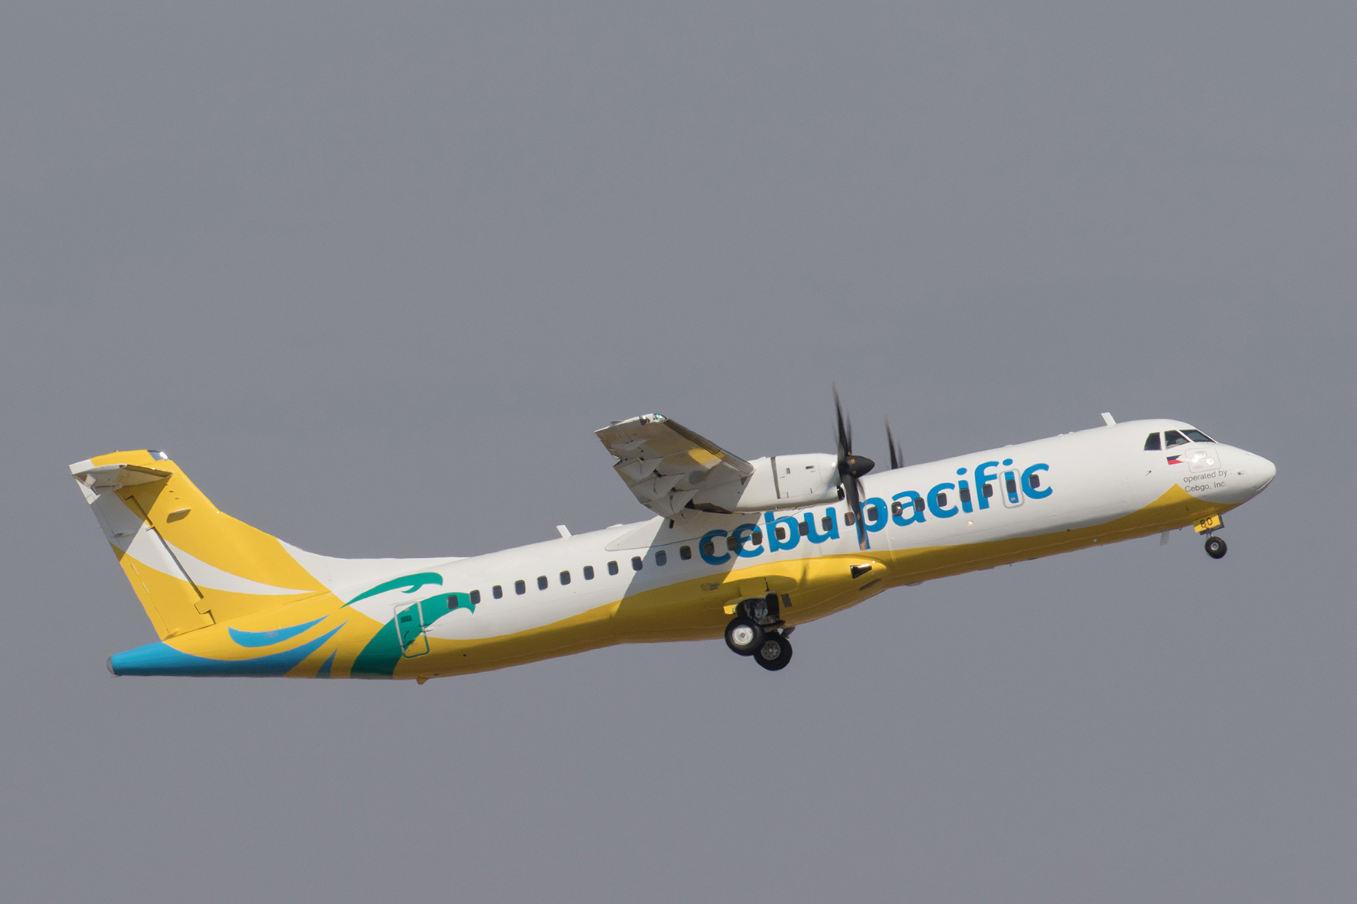 ATR focuses on high-growth Asia-Pacific region